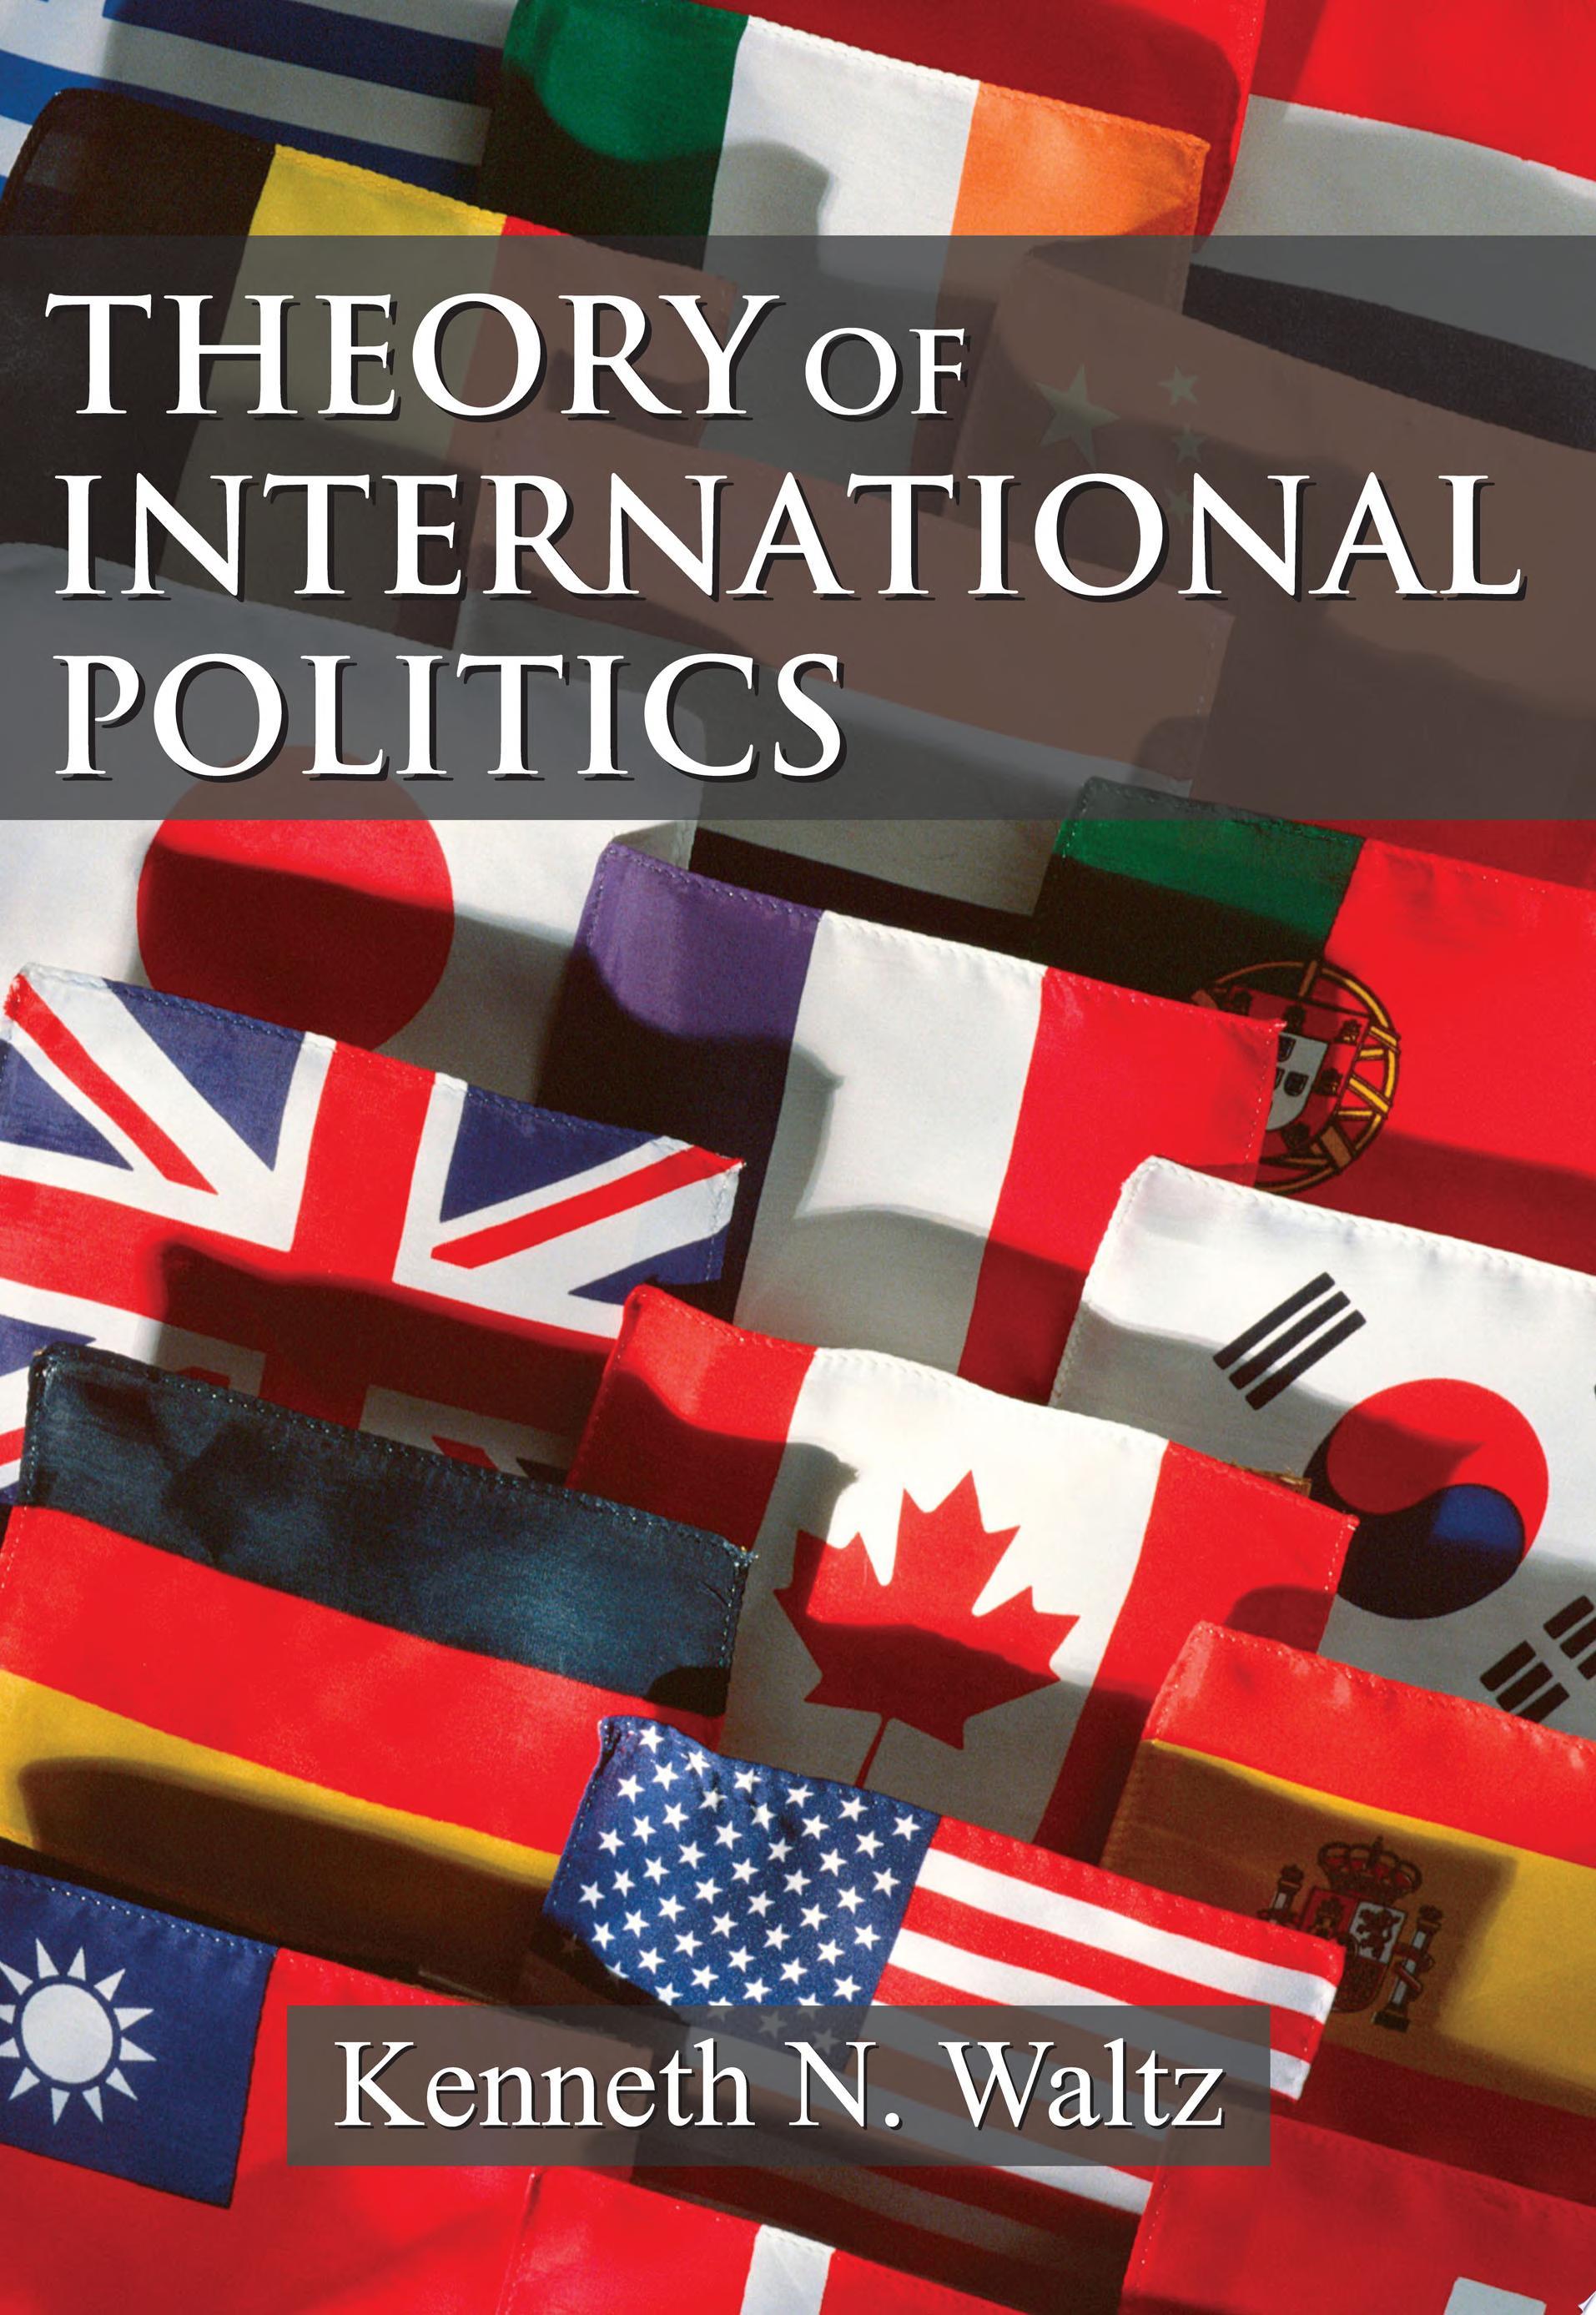 Theory of International Politics